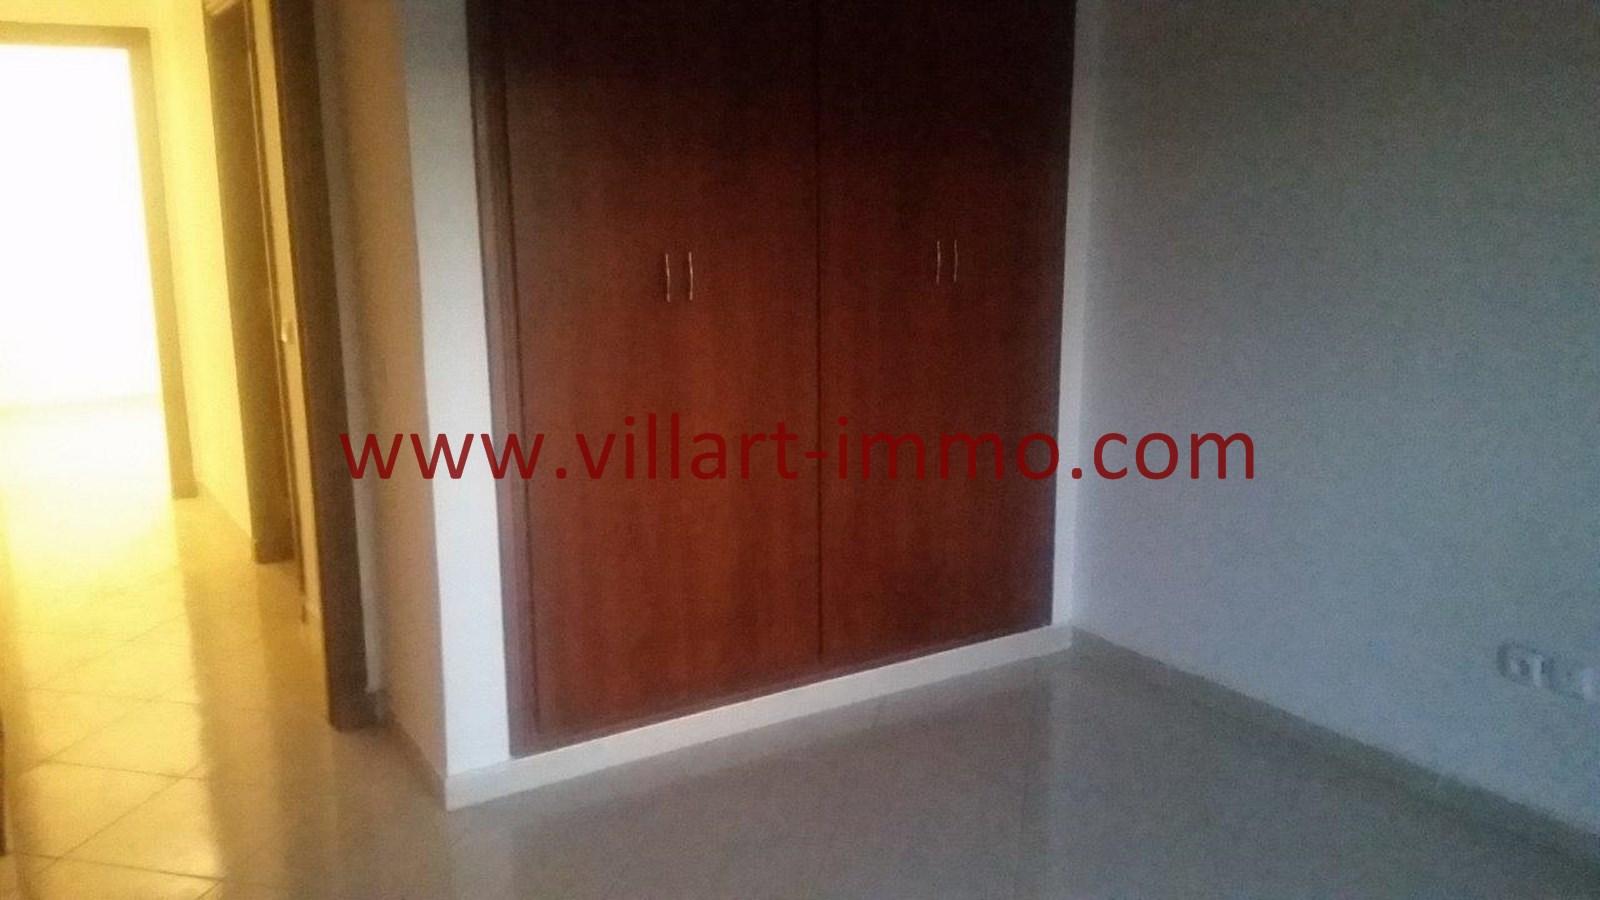 6-Location-Appartement-Non meublé-Tanger-Chambre'-L913-Villart immo